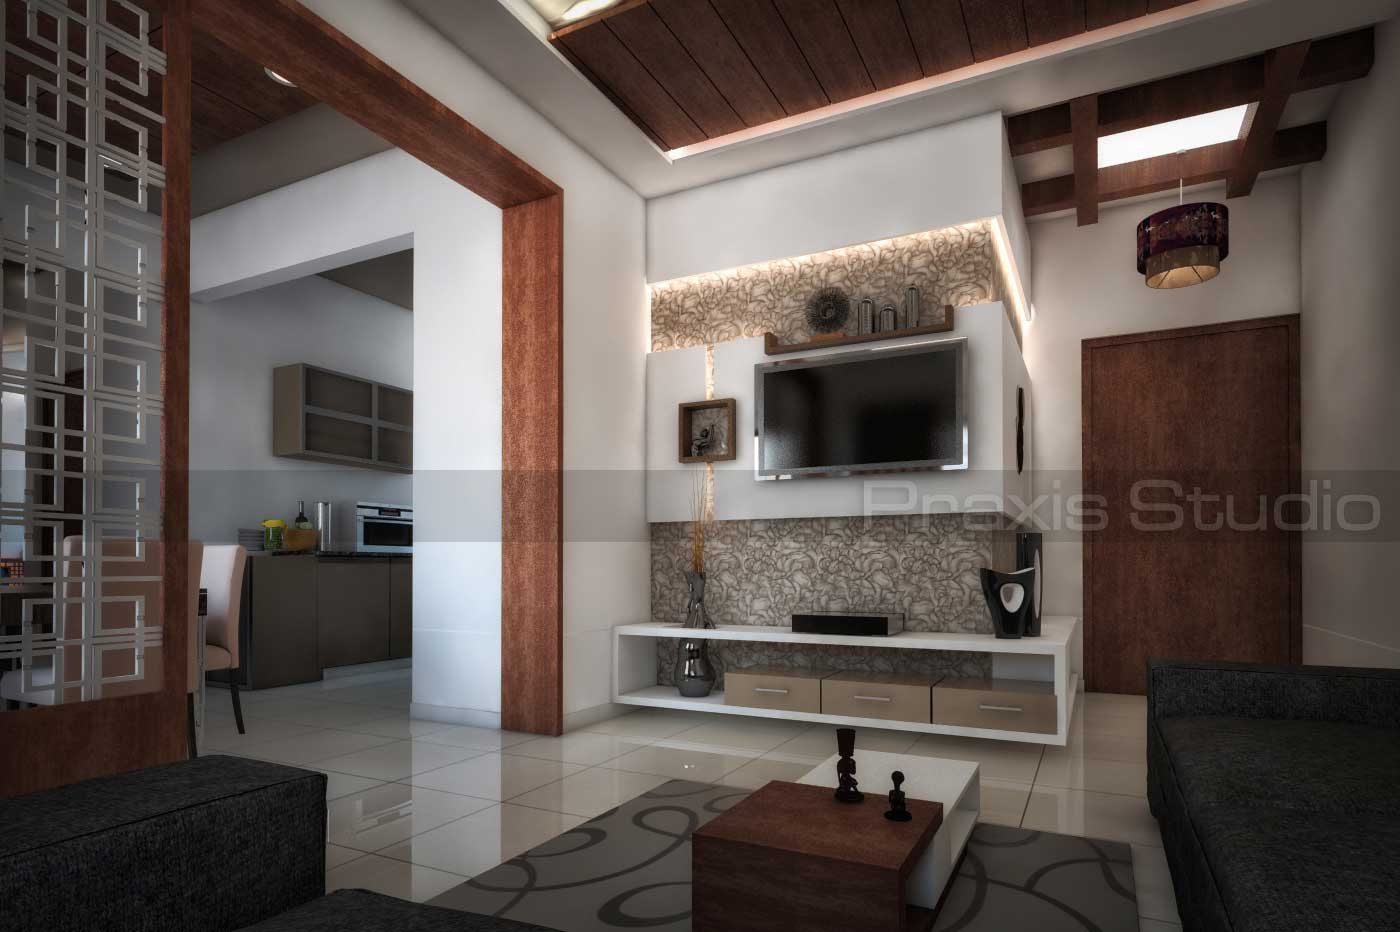 ... 3D Interior Walkthrough , 3d Walkthrough Design Studio, Commercial 3D  Walkthrough , 3D Exterior Walkthrough, Residential 3D Walkthrough,  Industrial 3D ...